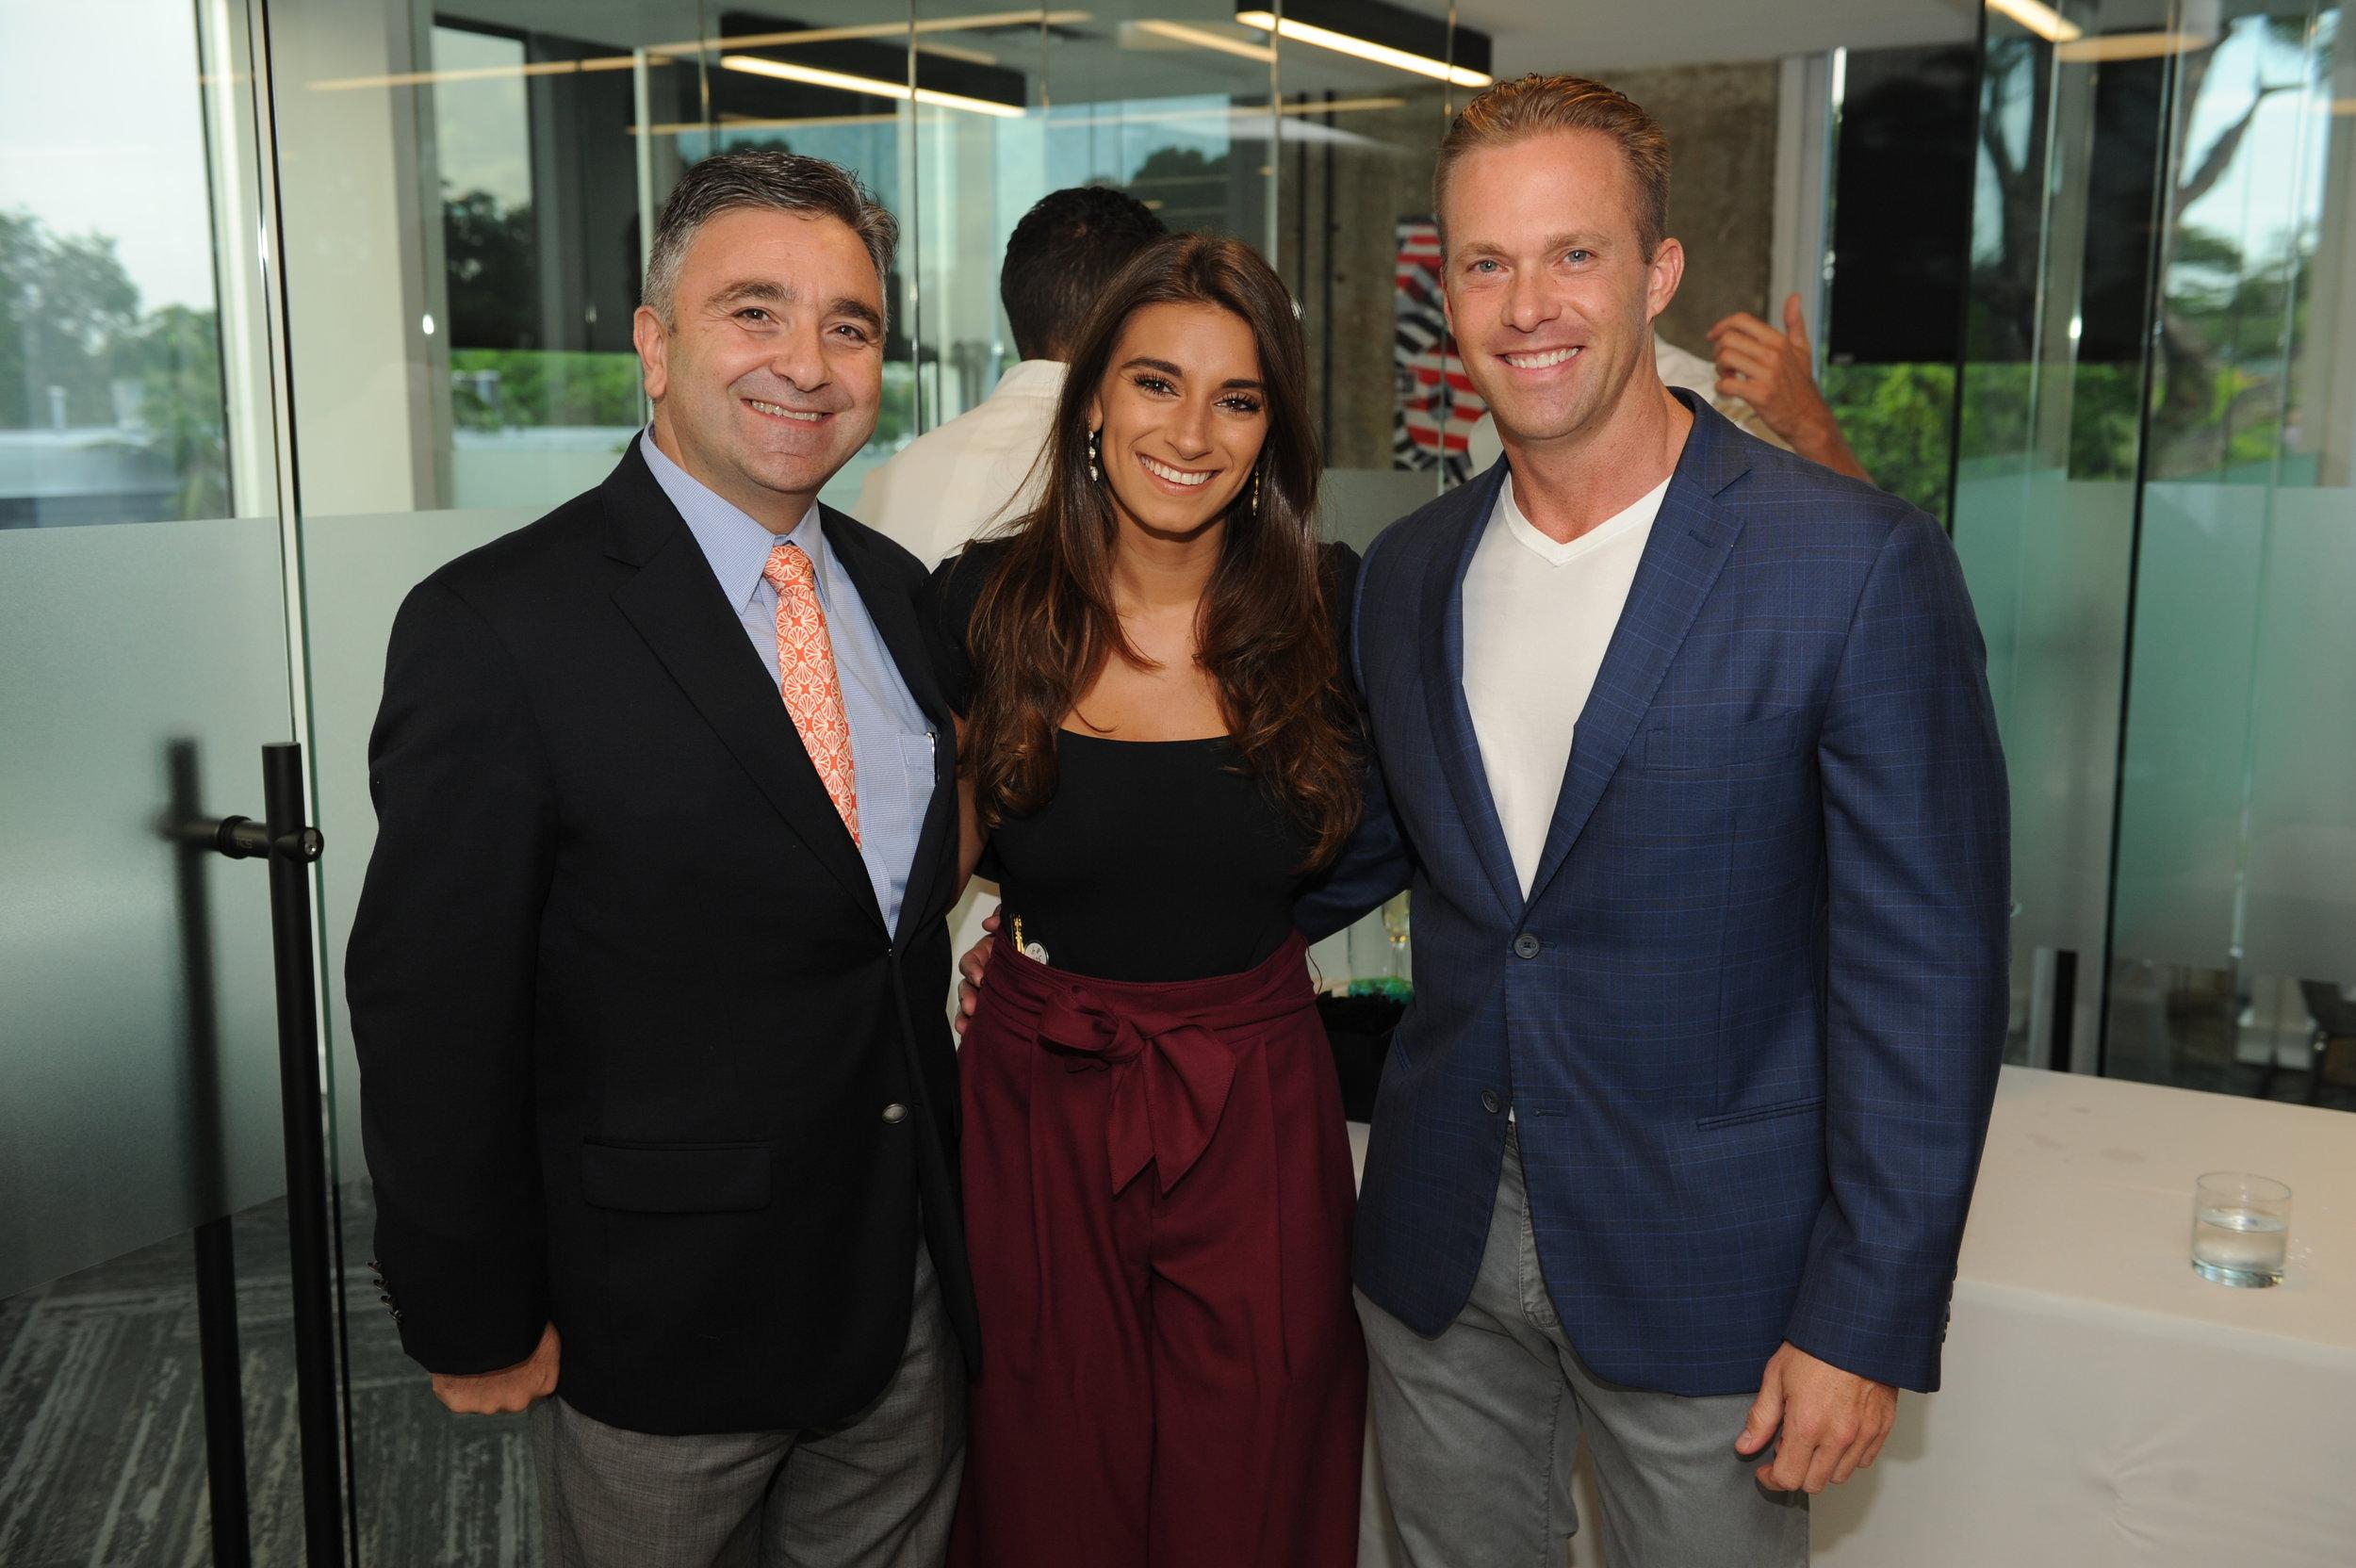 Imad Akhrass, Rachel Goldstein, & Darin Tansey